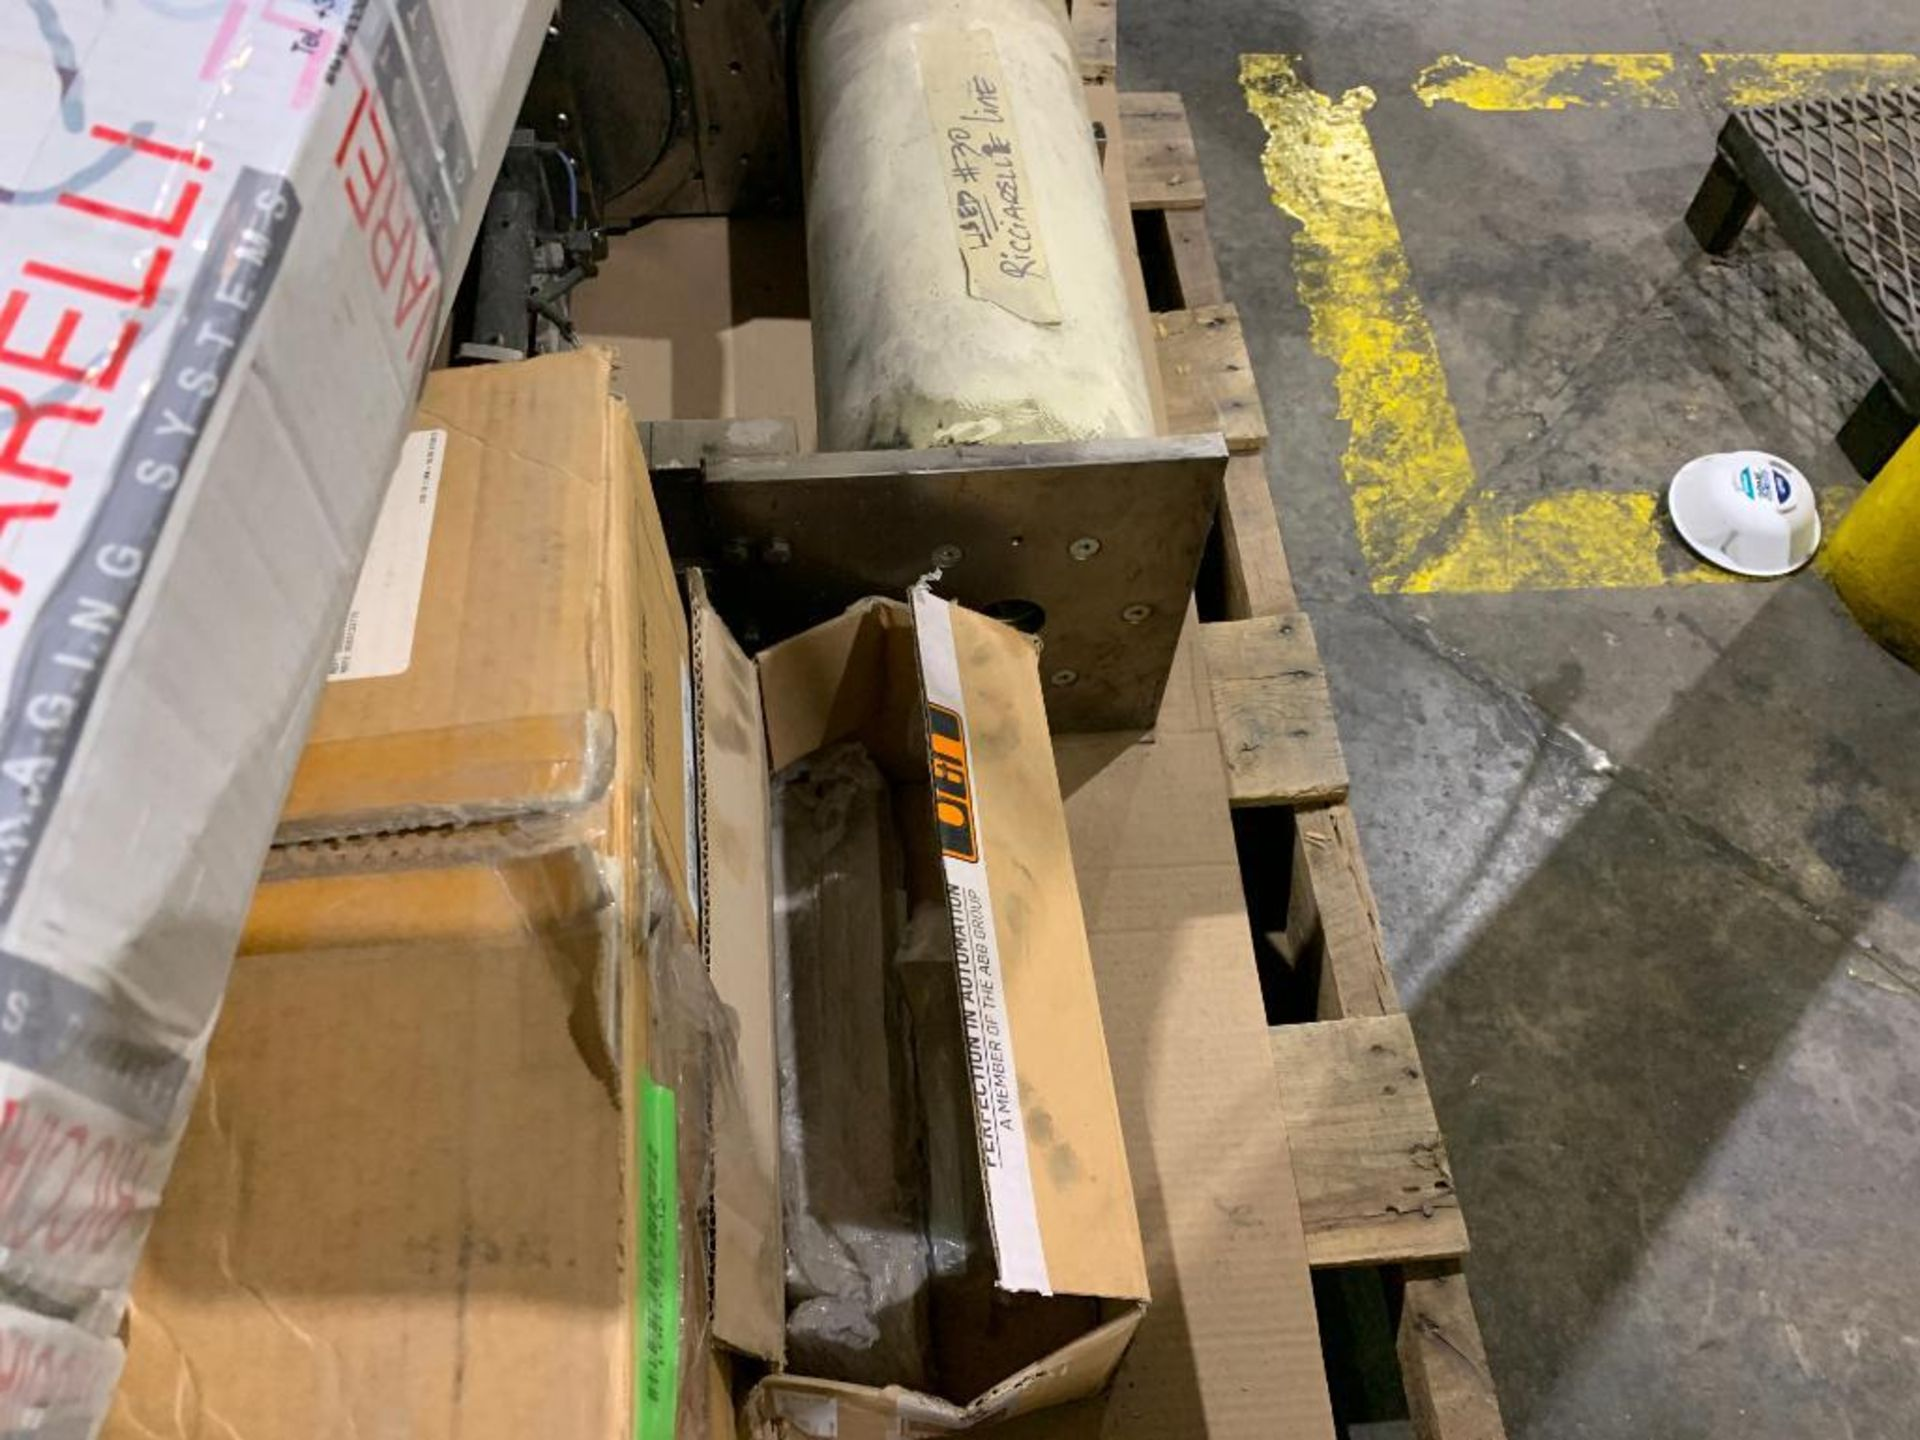 2010 Ricciarelli long goods horizontal flow wrapper - Image 73 of 79